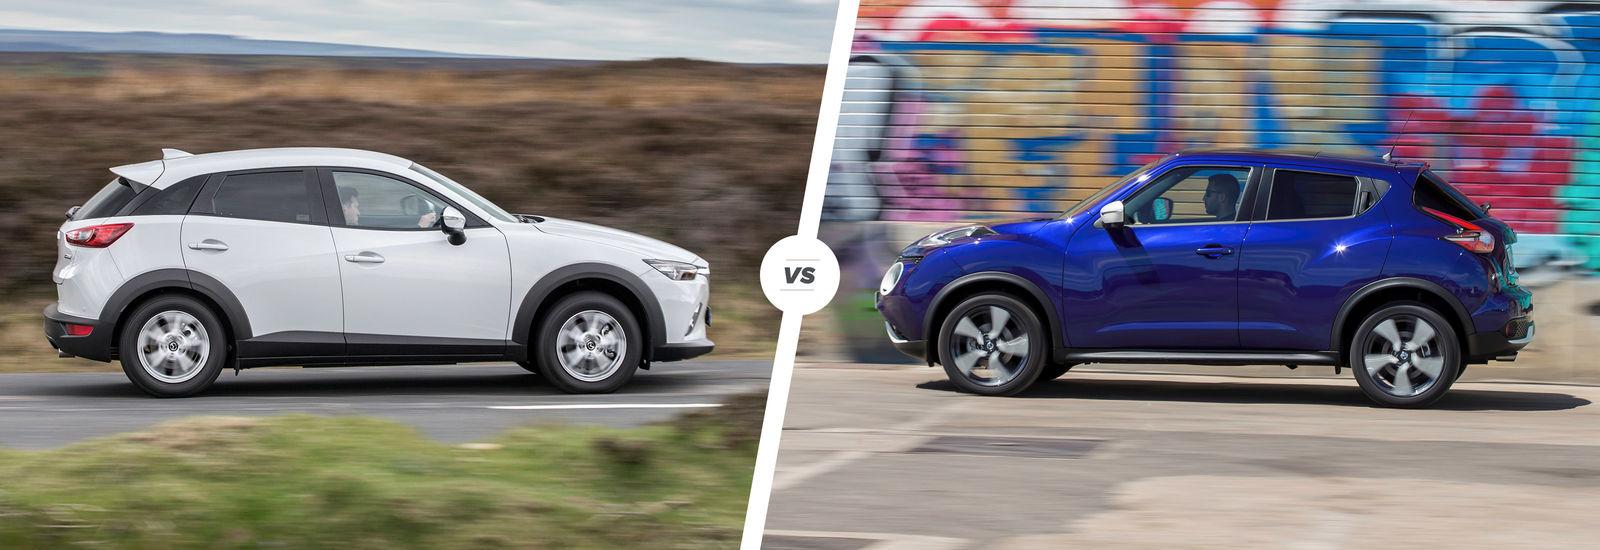 Mazda CX3 vs Nissan Juke crossover clash  carwow